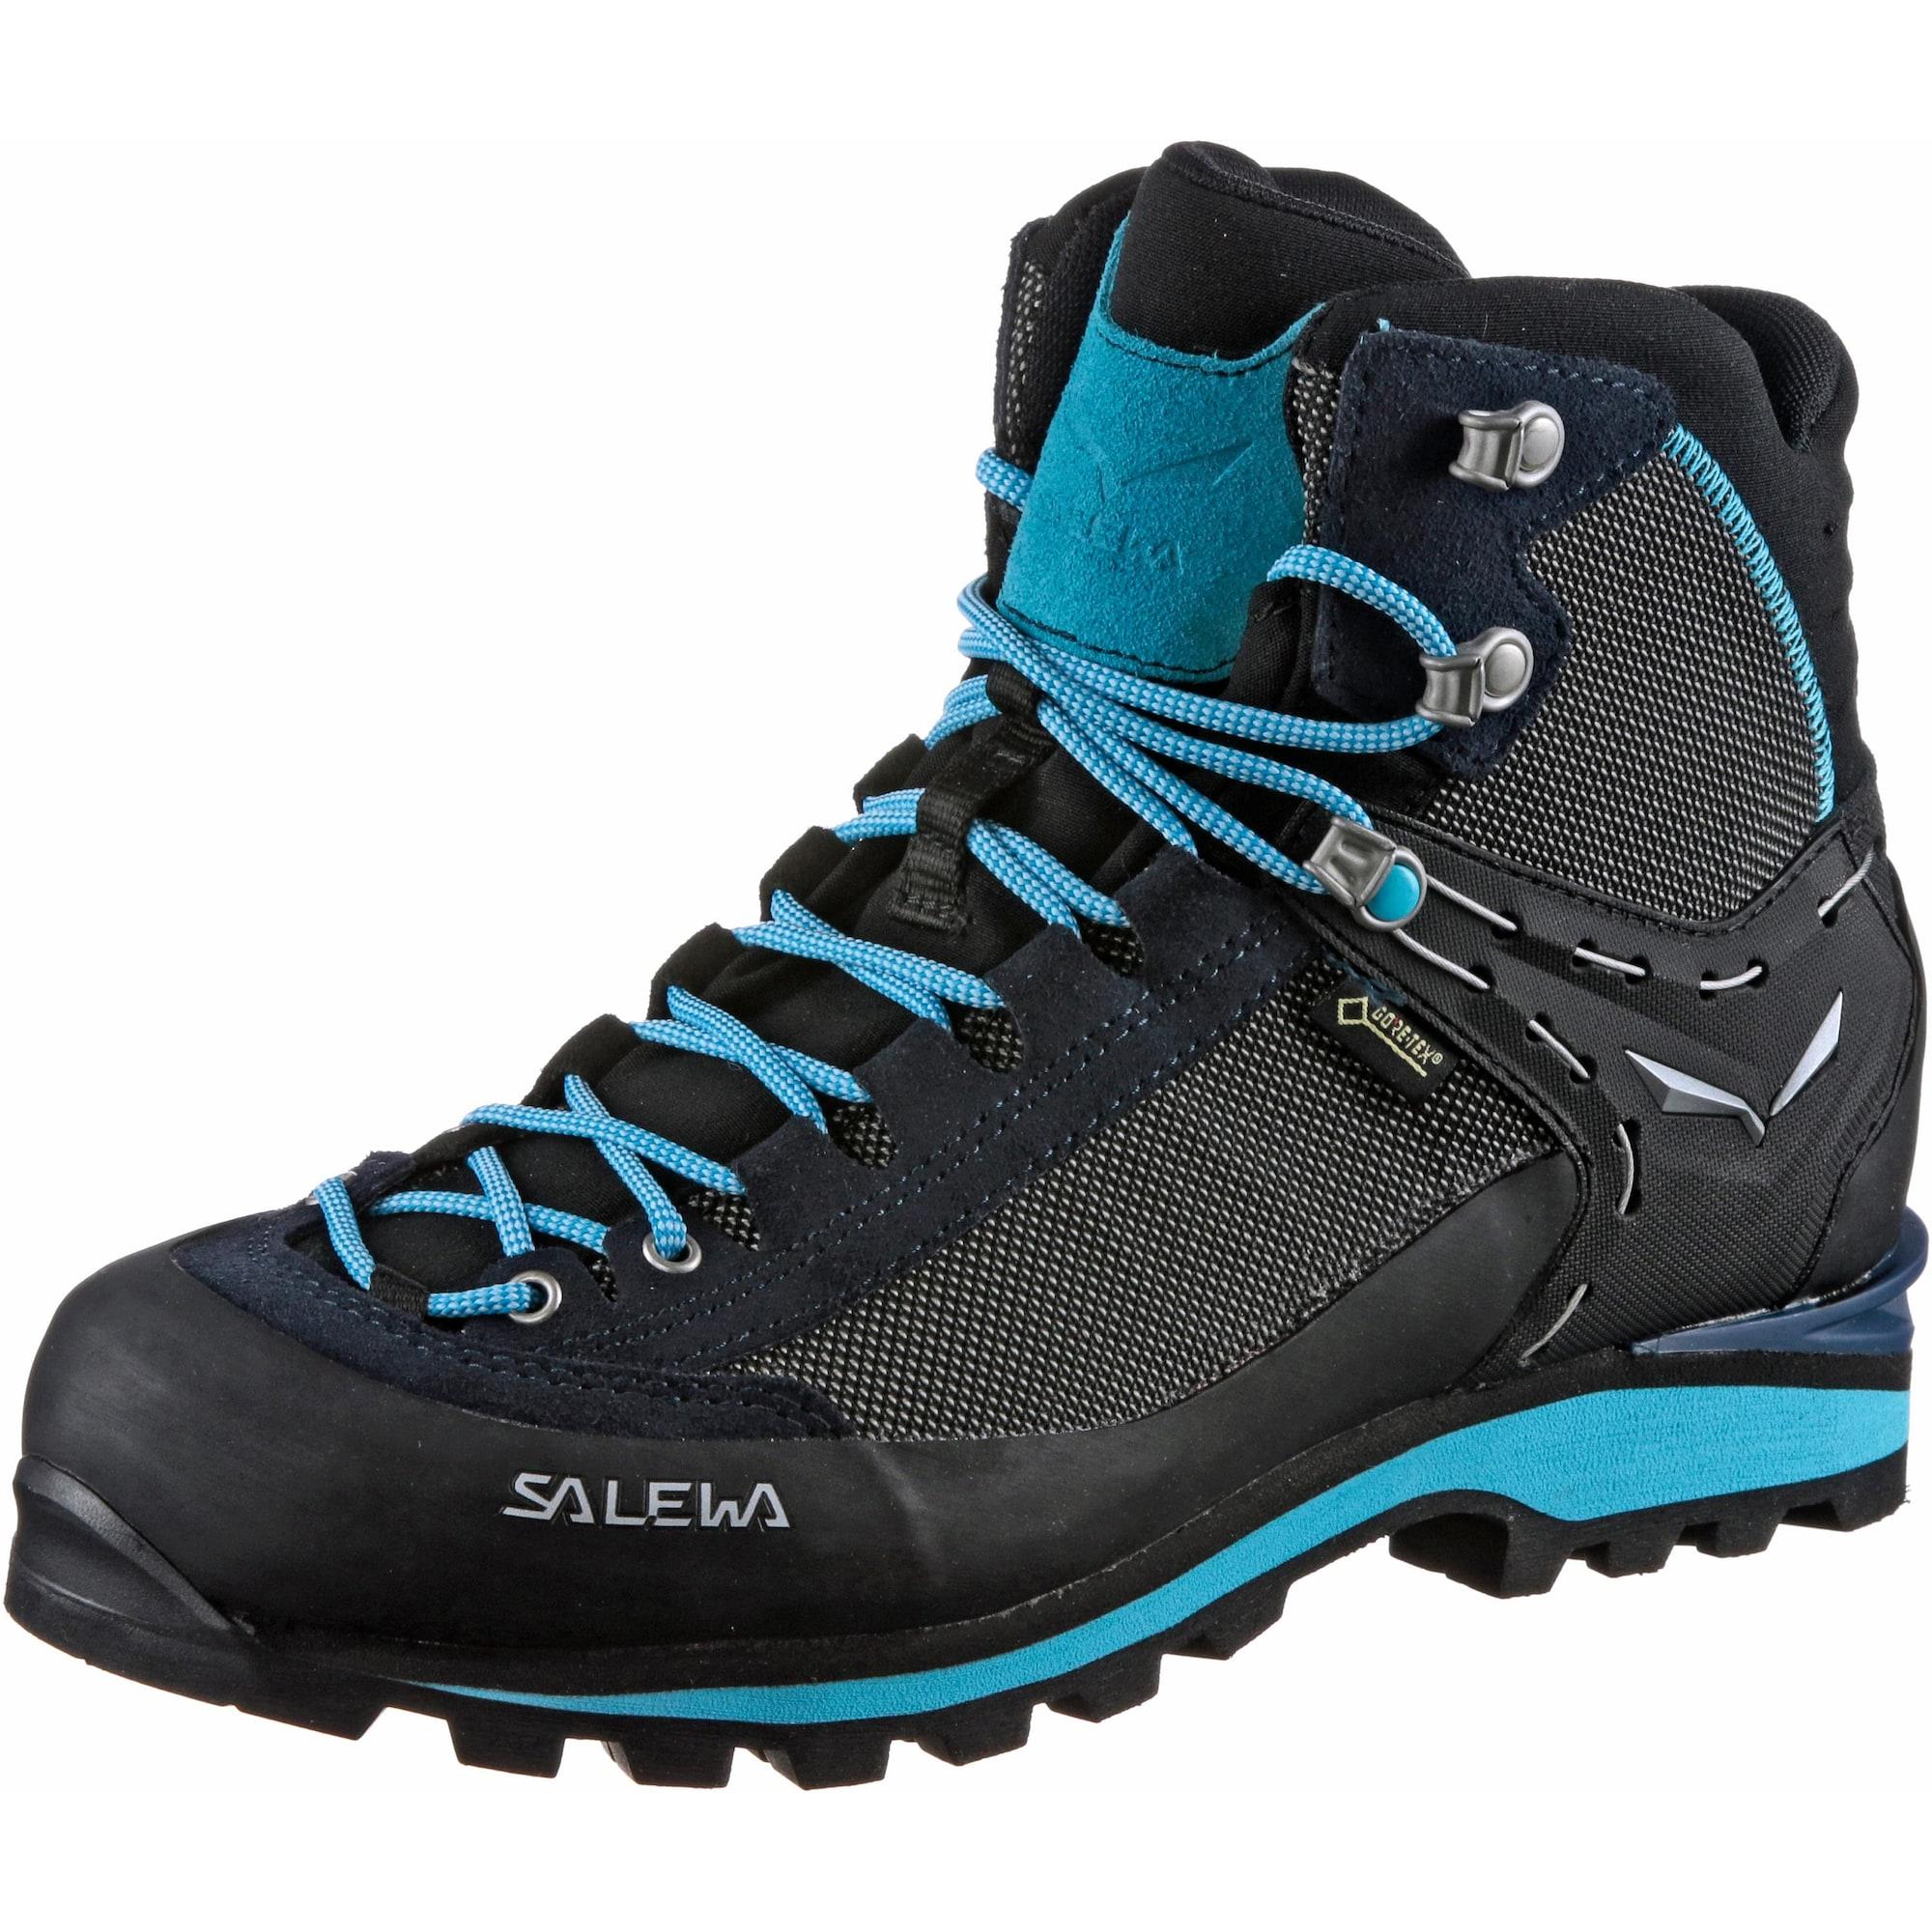 'WS CROW GTX' Alpine Bergschuhe | Schuhe > Outdoorschuhe > Bergschuhe | Salewa